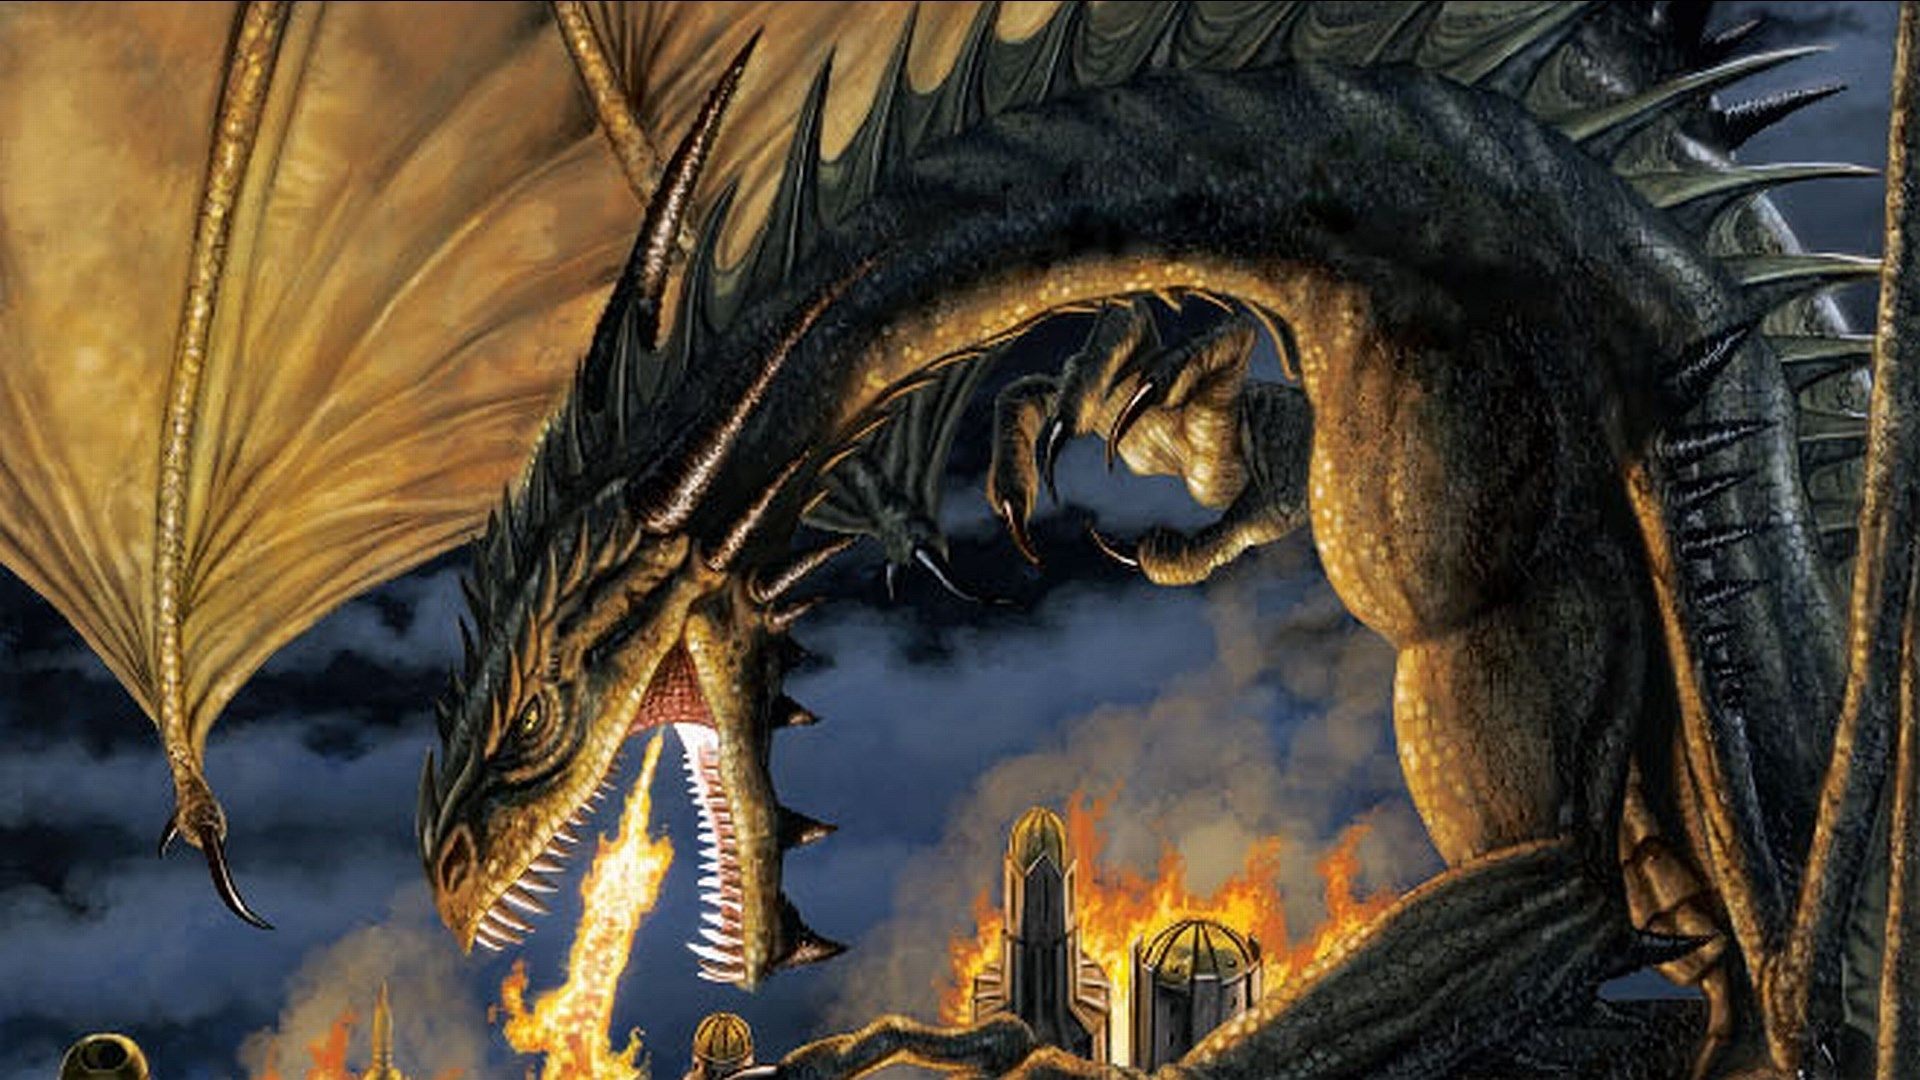 Popular Wallpaper High Quality Dragon - fae0c5ff0575670d525381c0cacbd05d  HD_82591.jpg